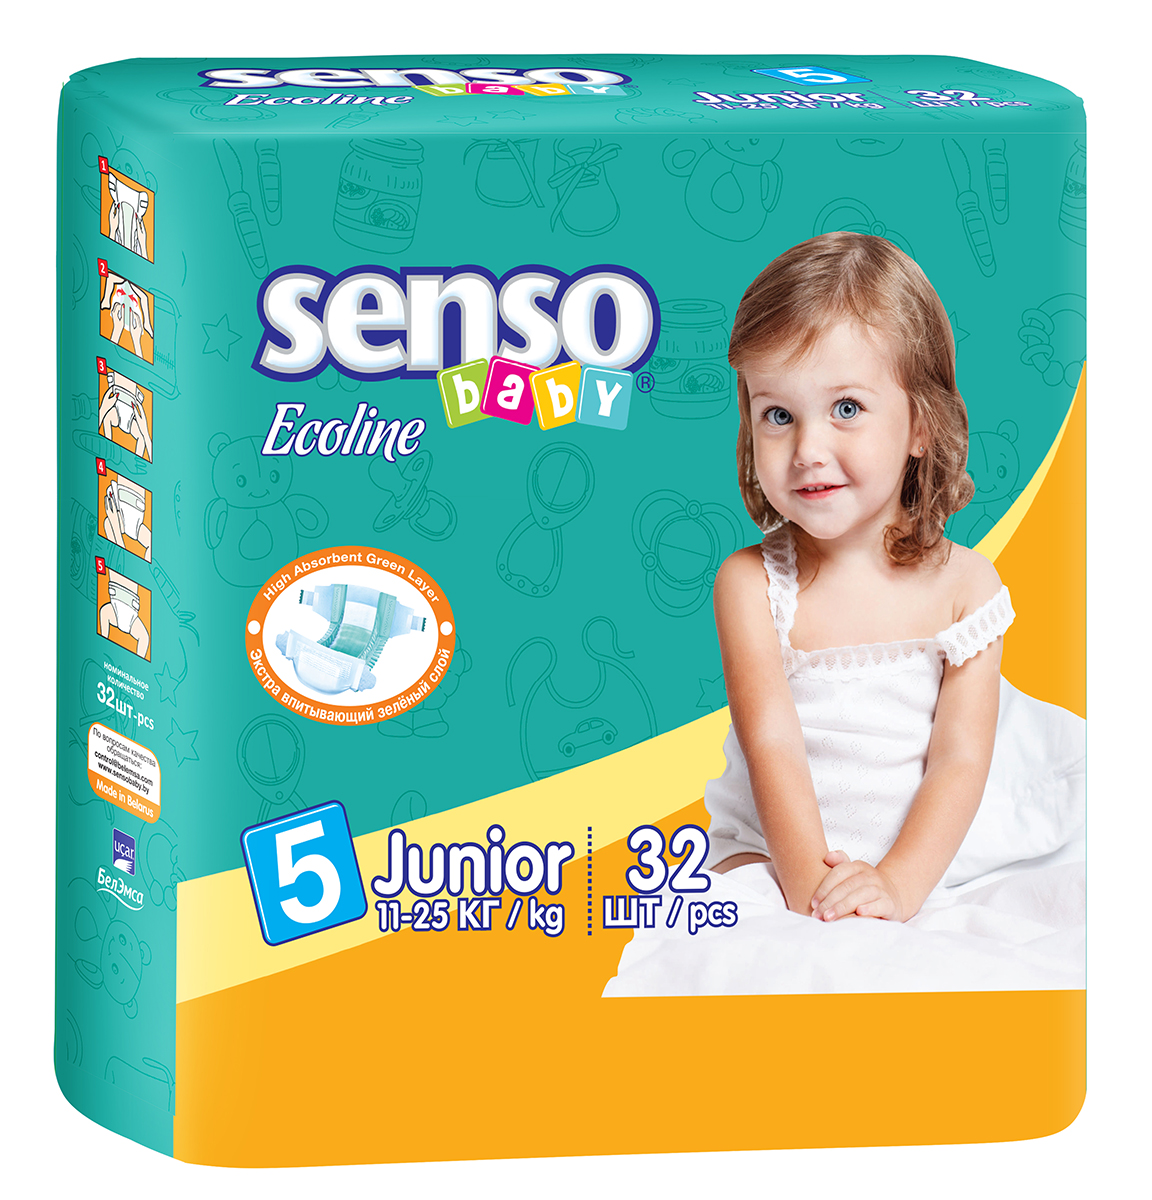 Senso Baby Ecoline Подгузники Junior 11-25 кг 32 шт onex 3d pic ecoline explore